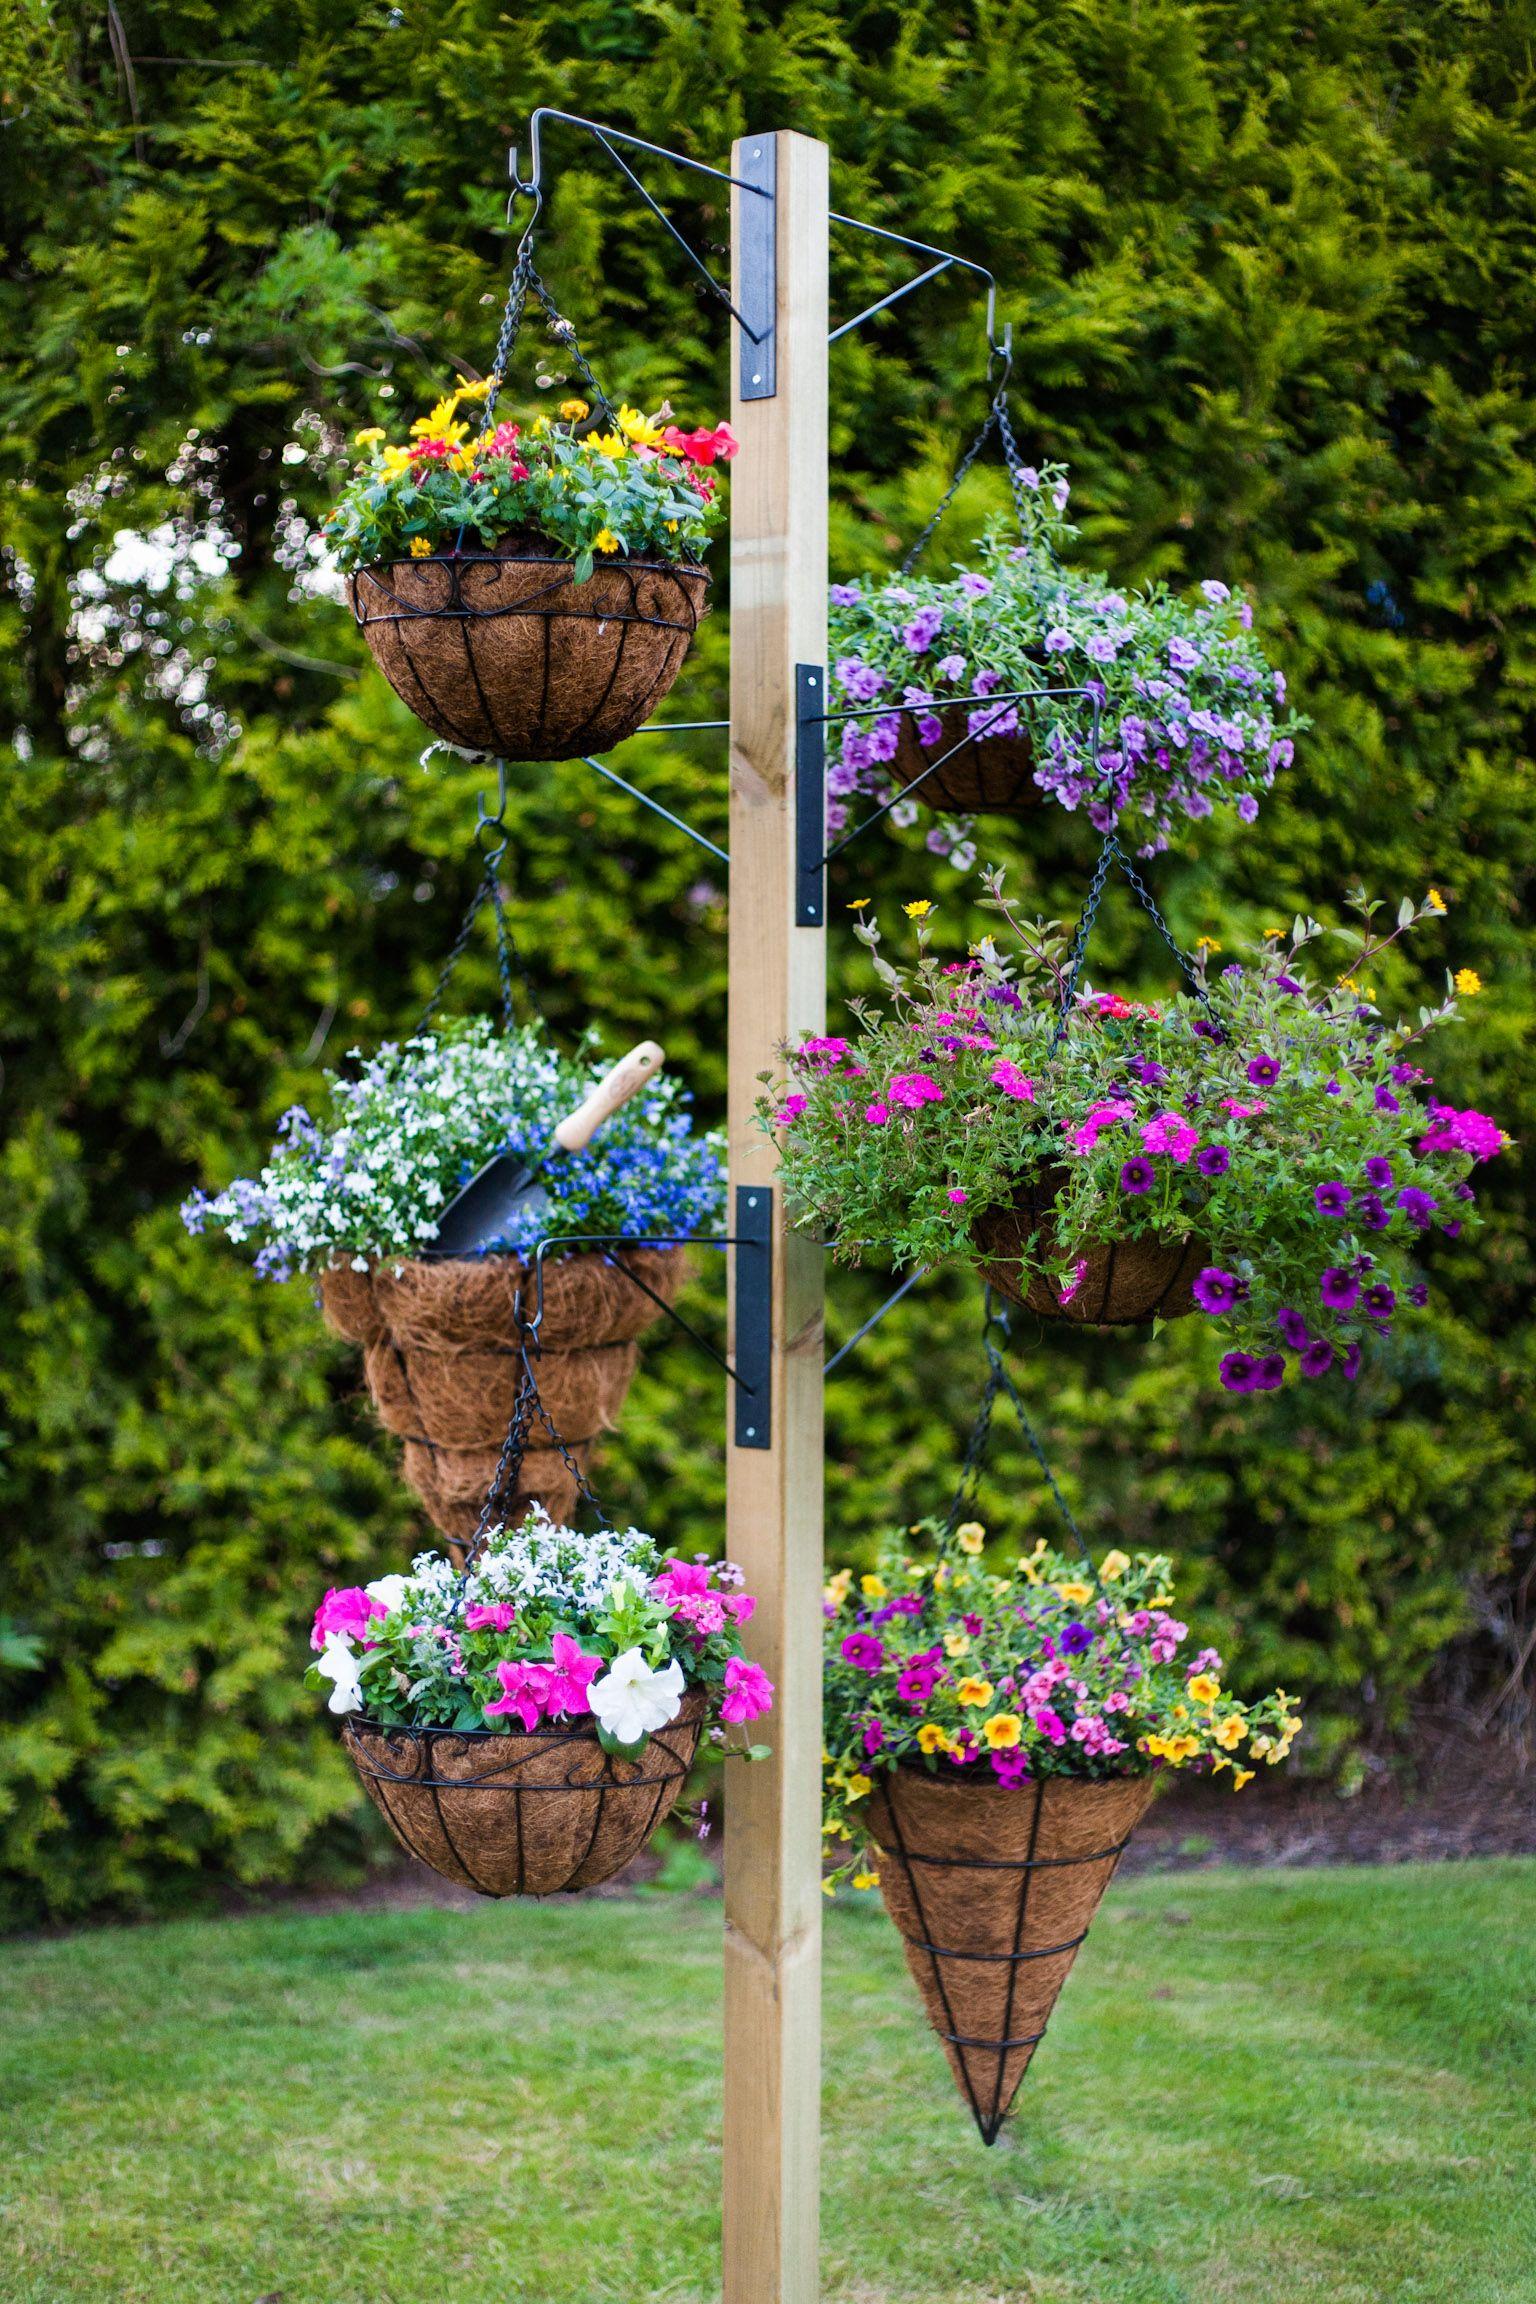 Free Standing Hanging Basket Stand Jardinagem E Decoracao Jardinagem Jardins Pequenos